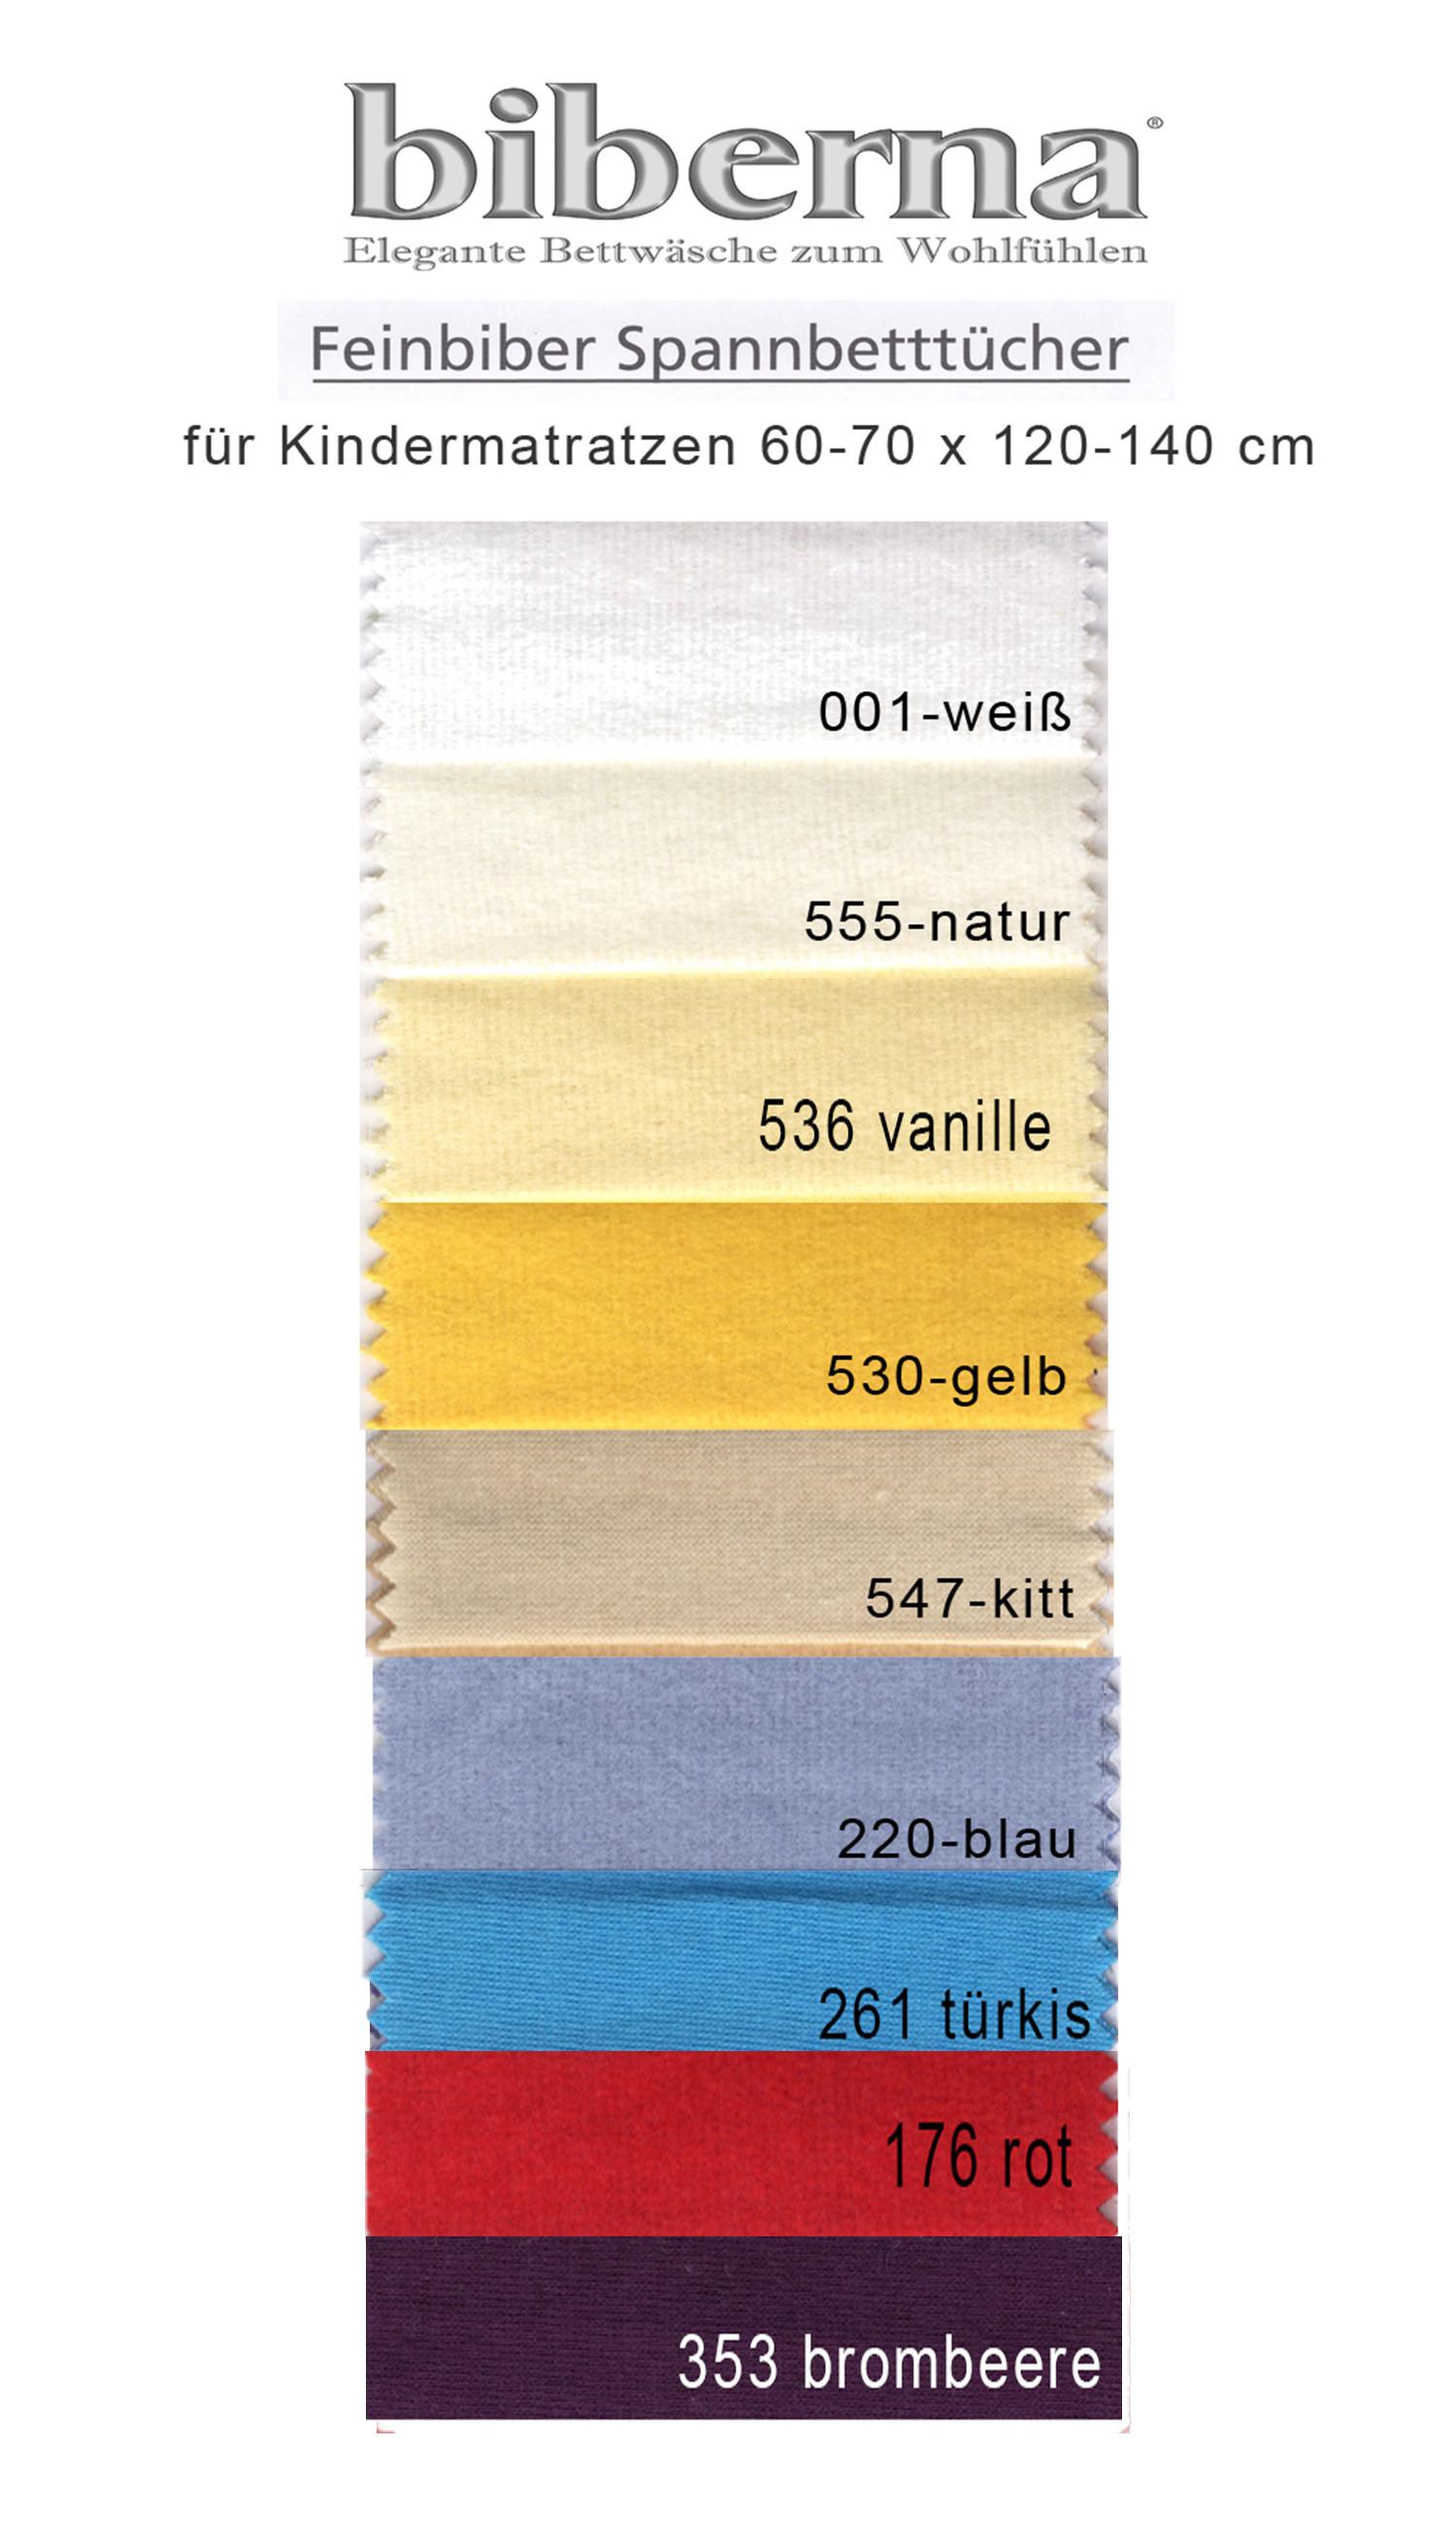 Biberna Kinder Baby Fein Biber Spannbettlaken 70x140 in 9 Farben